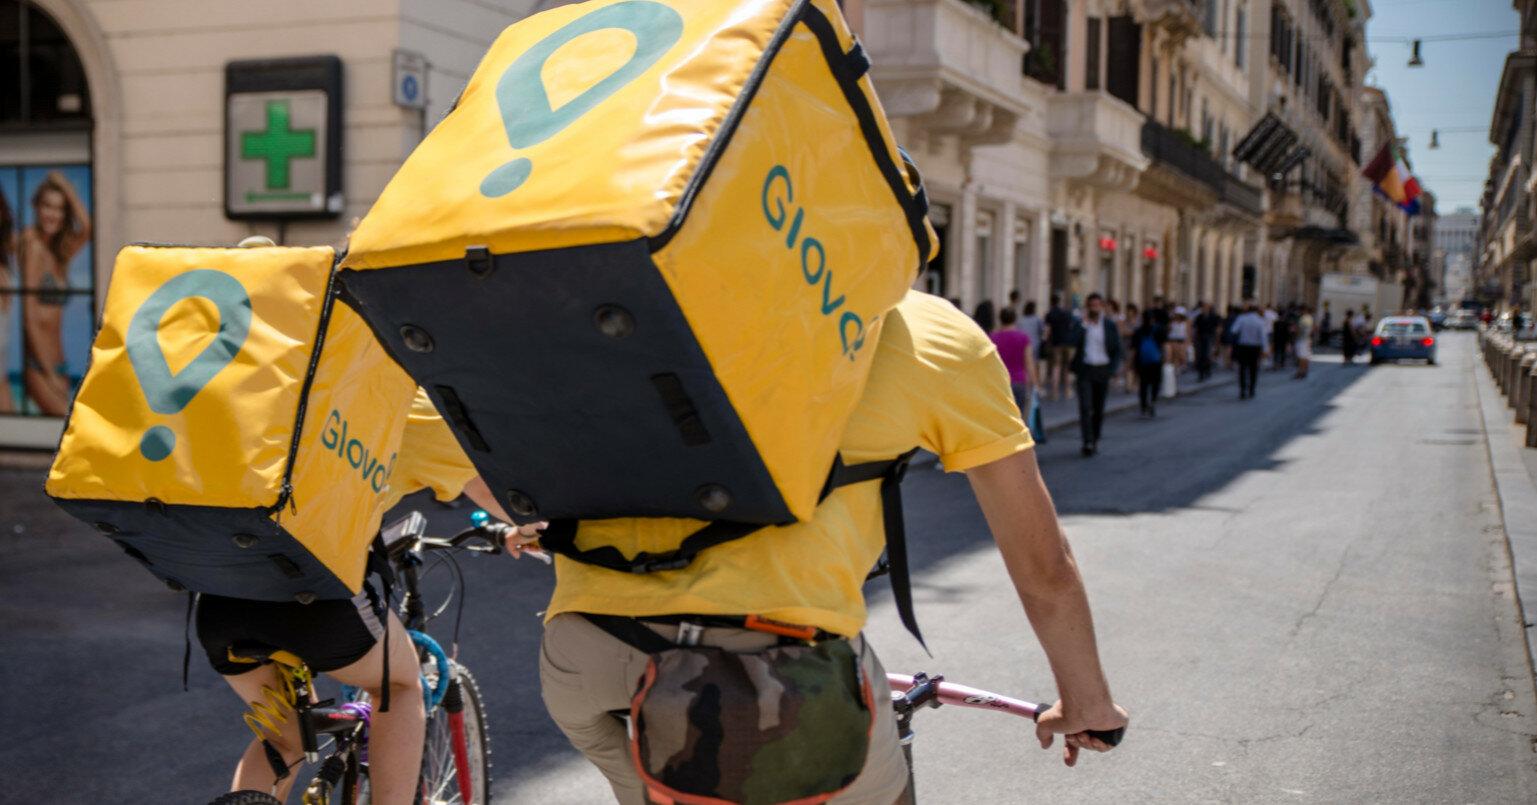 Сервис доставки Glovo подвергся кибератаке